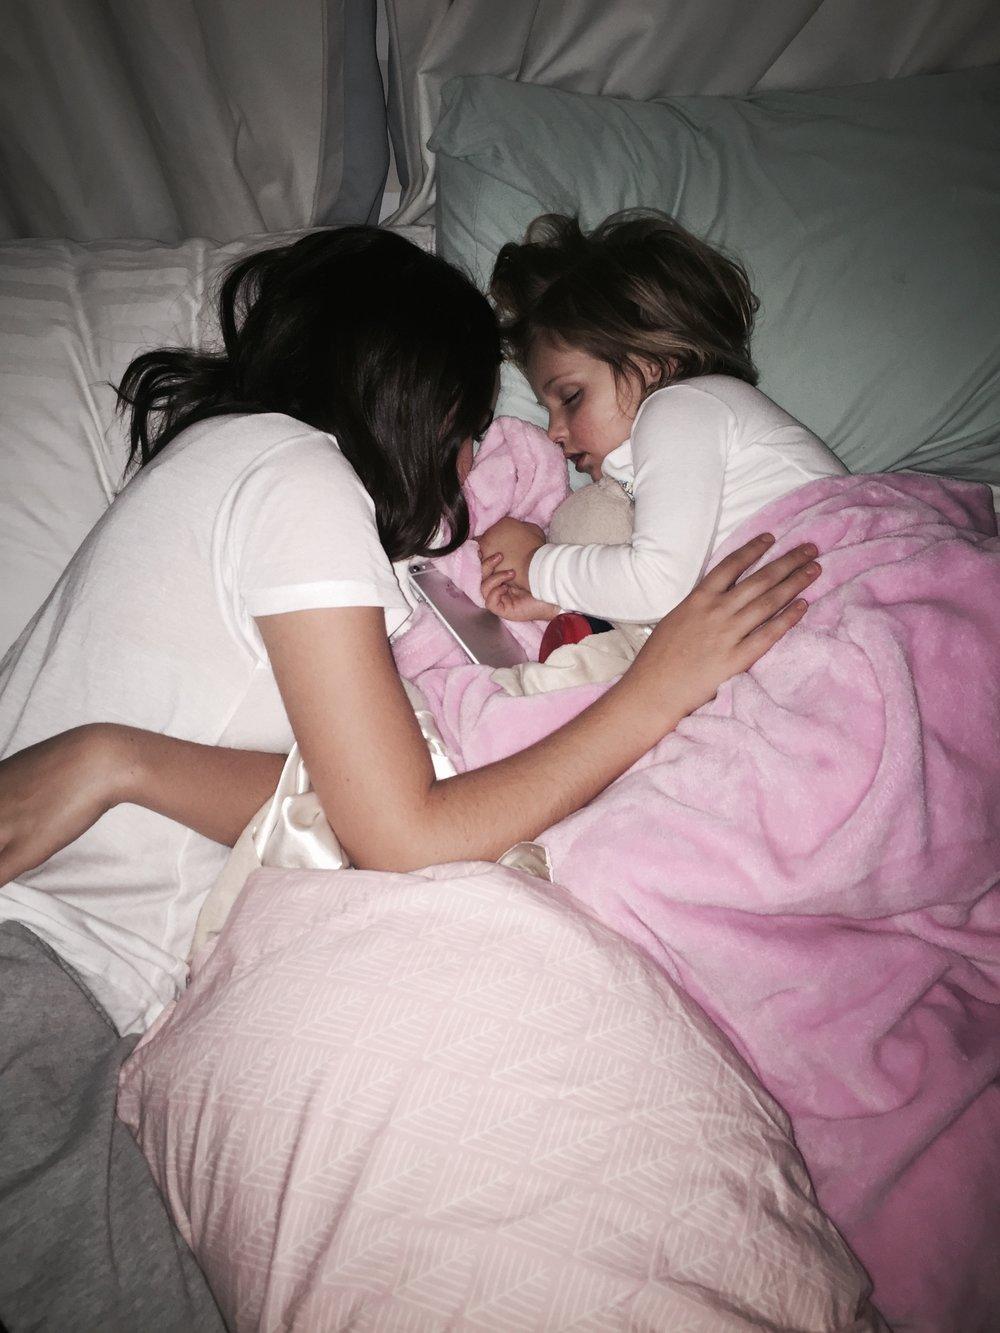 Riley Vilasuso & Bailee Madison - That Cozy Life